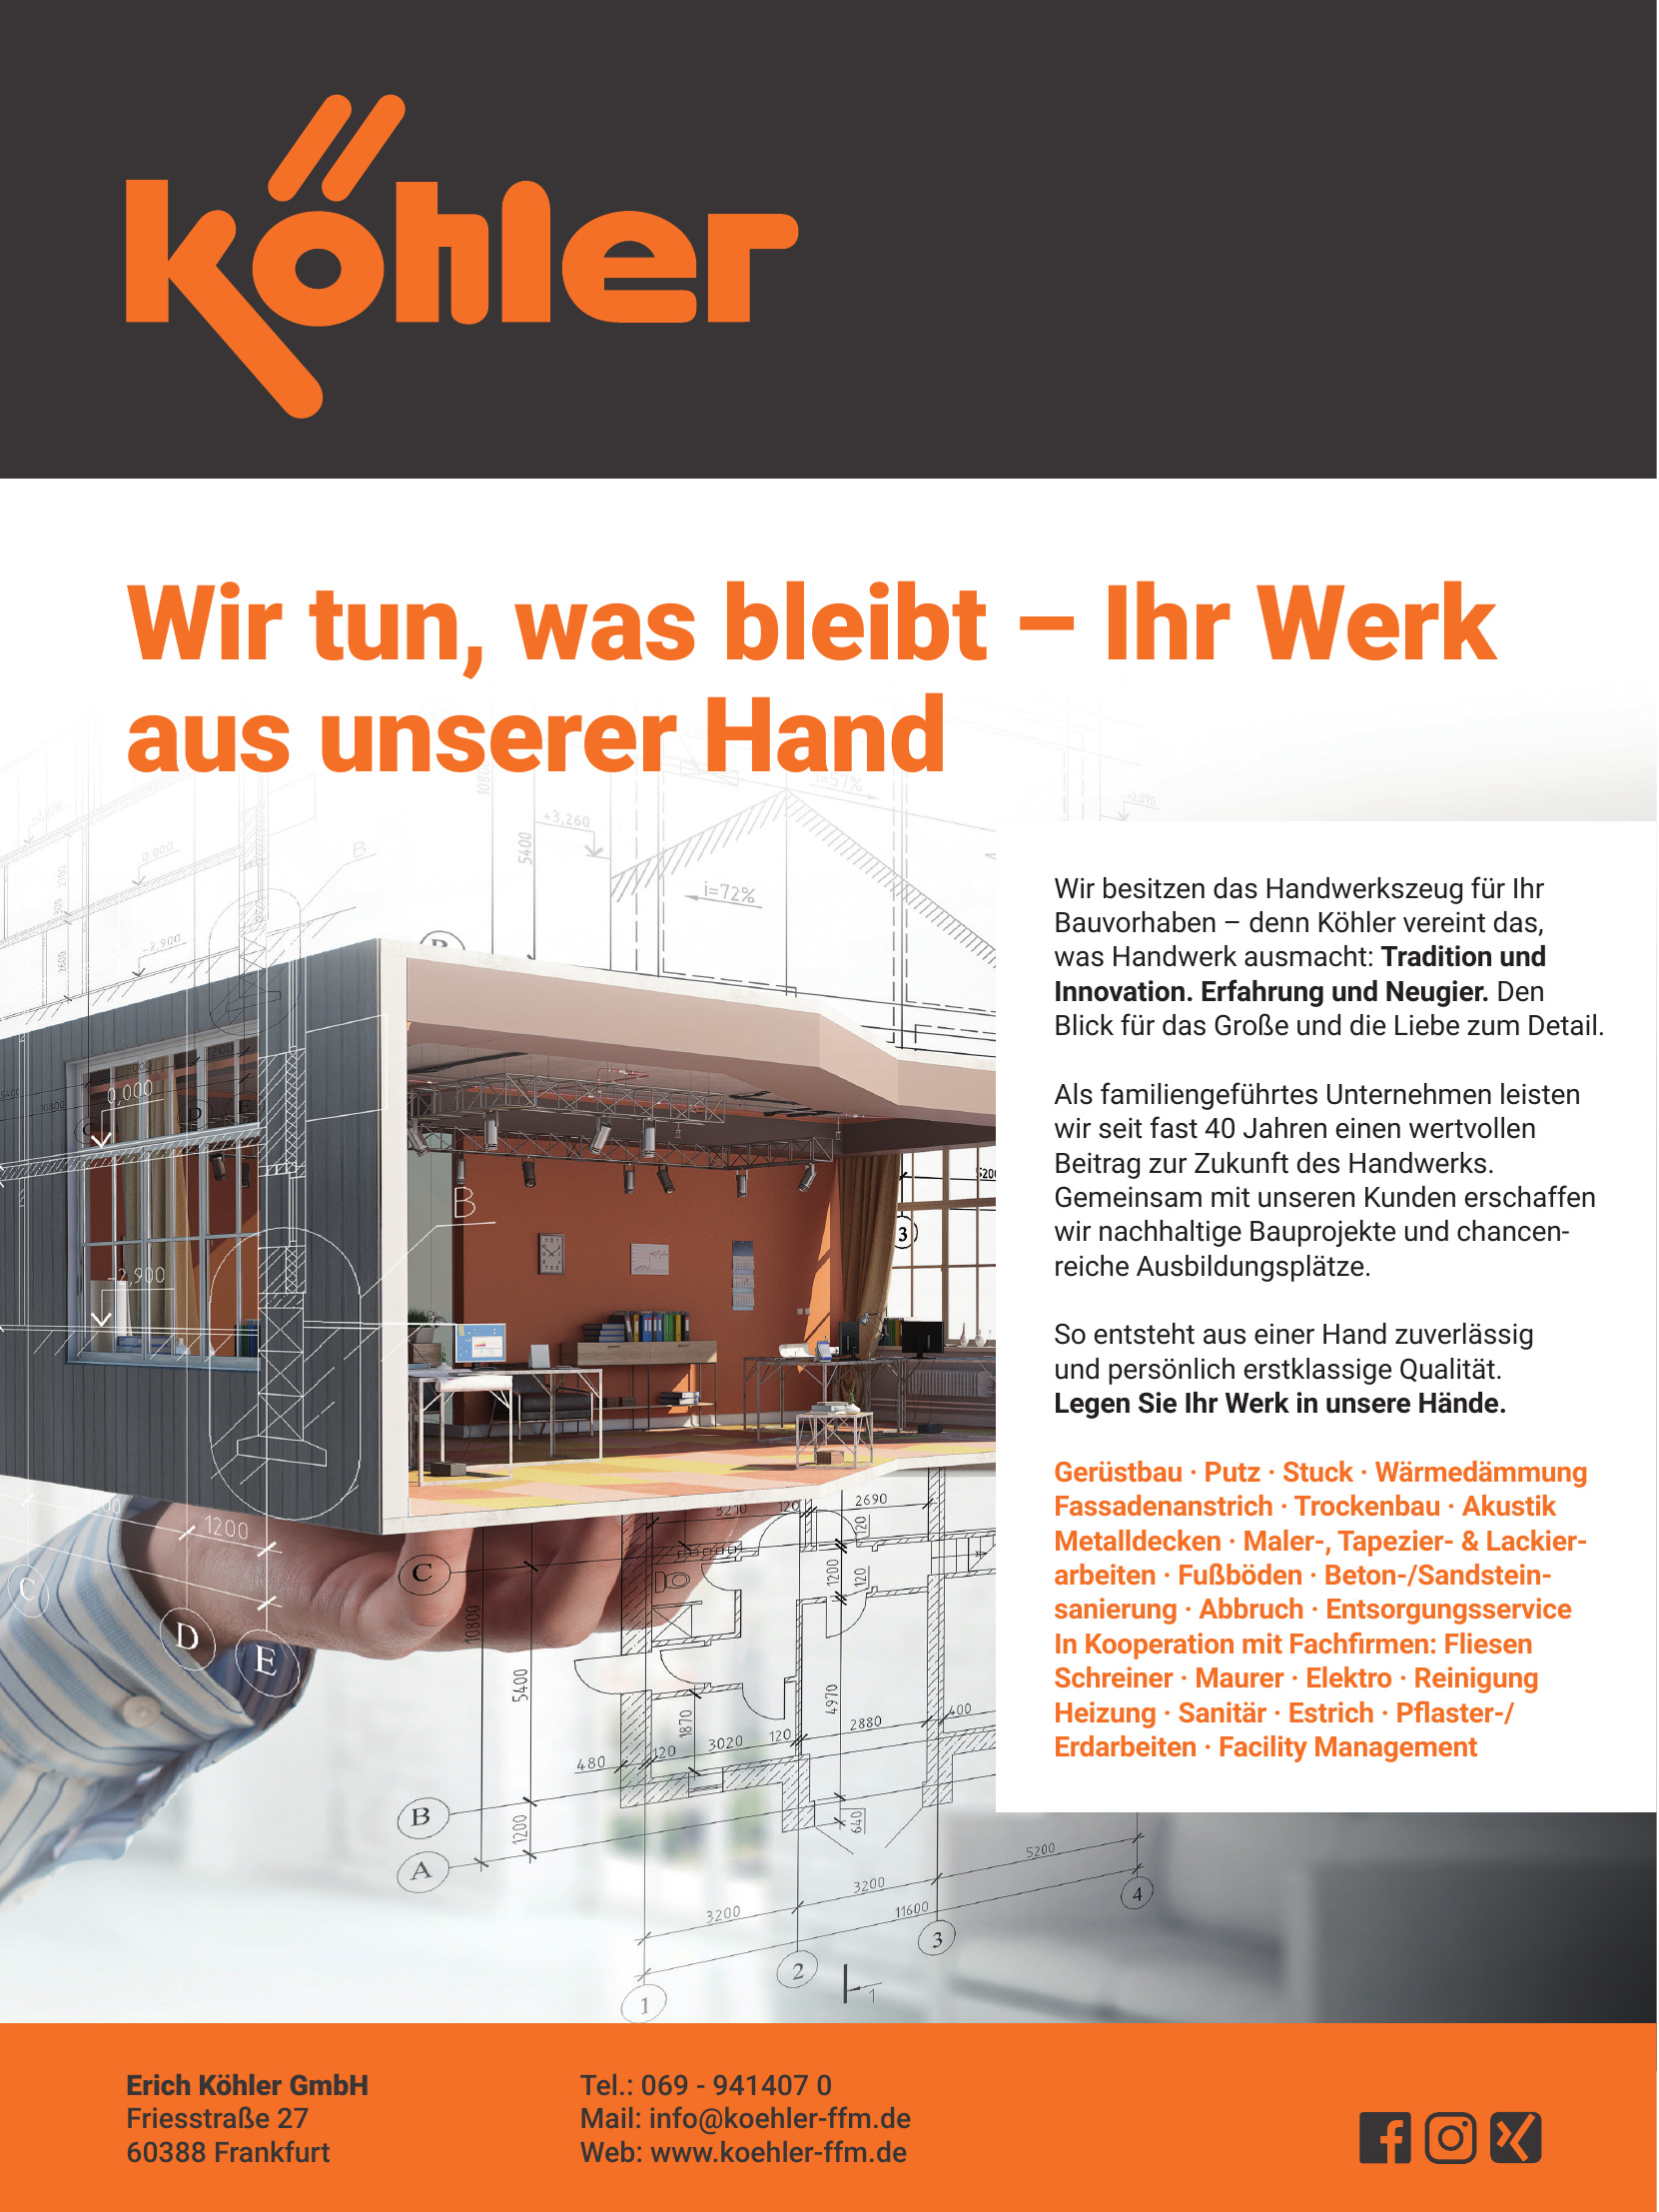 Erich Köhler GmbH